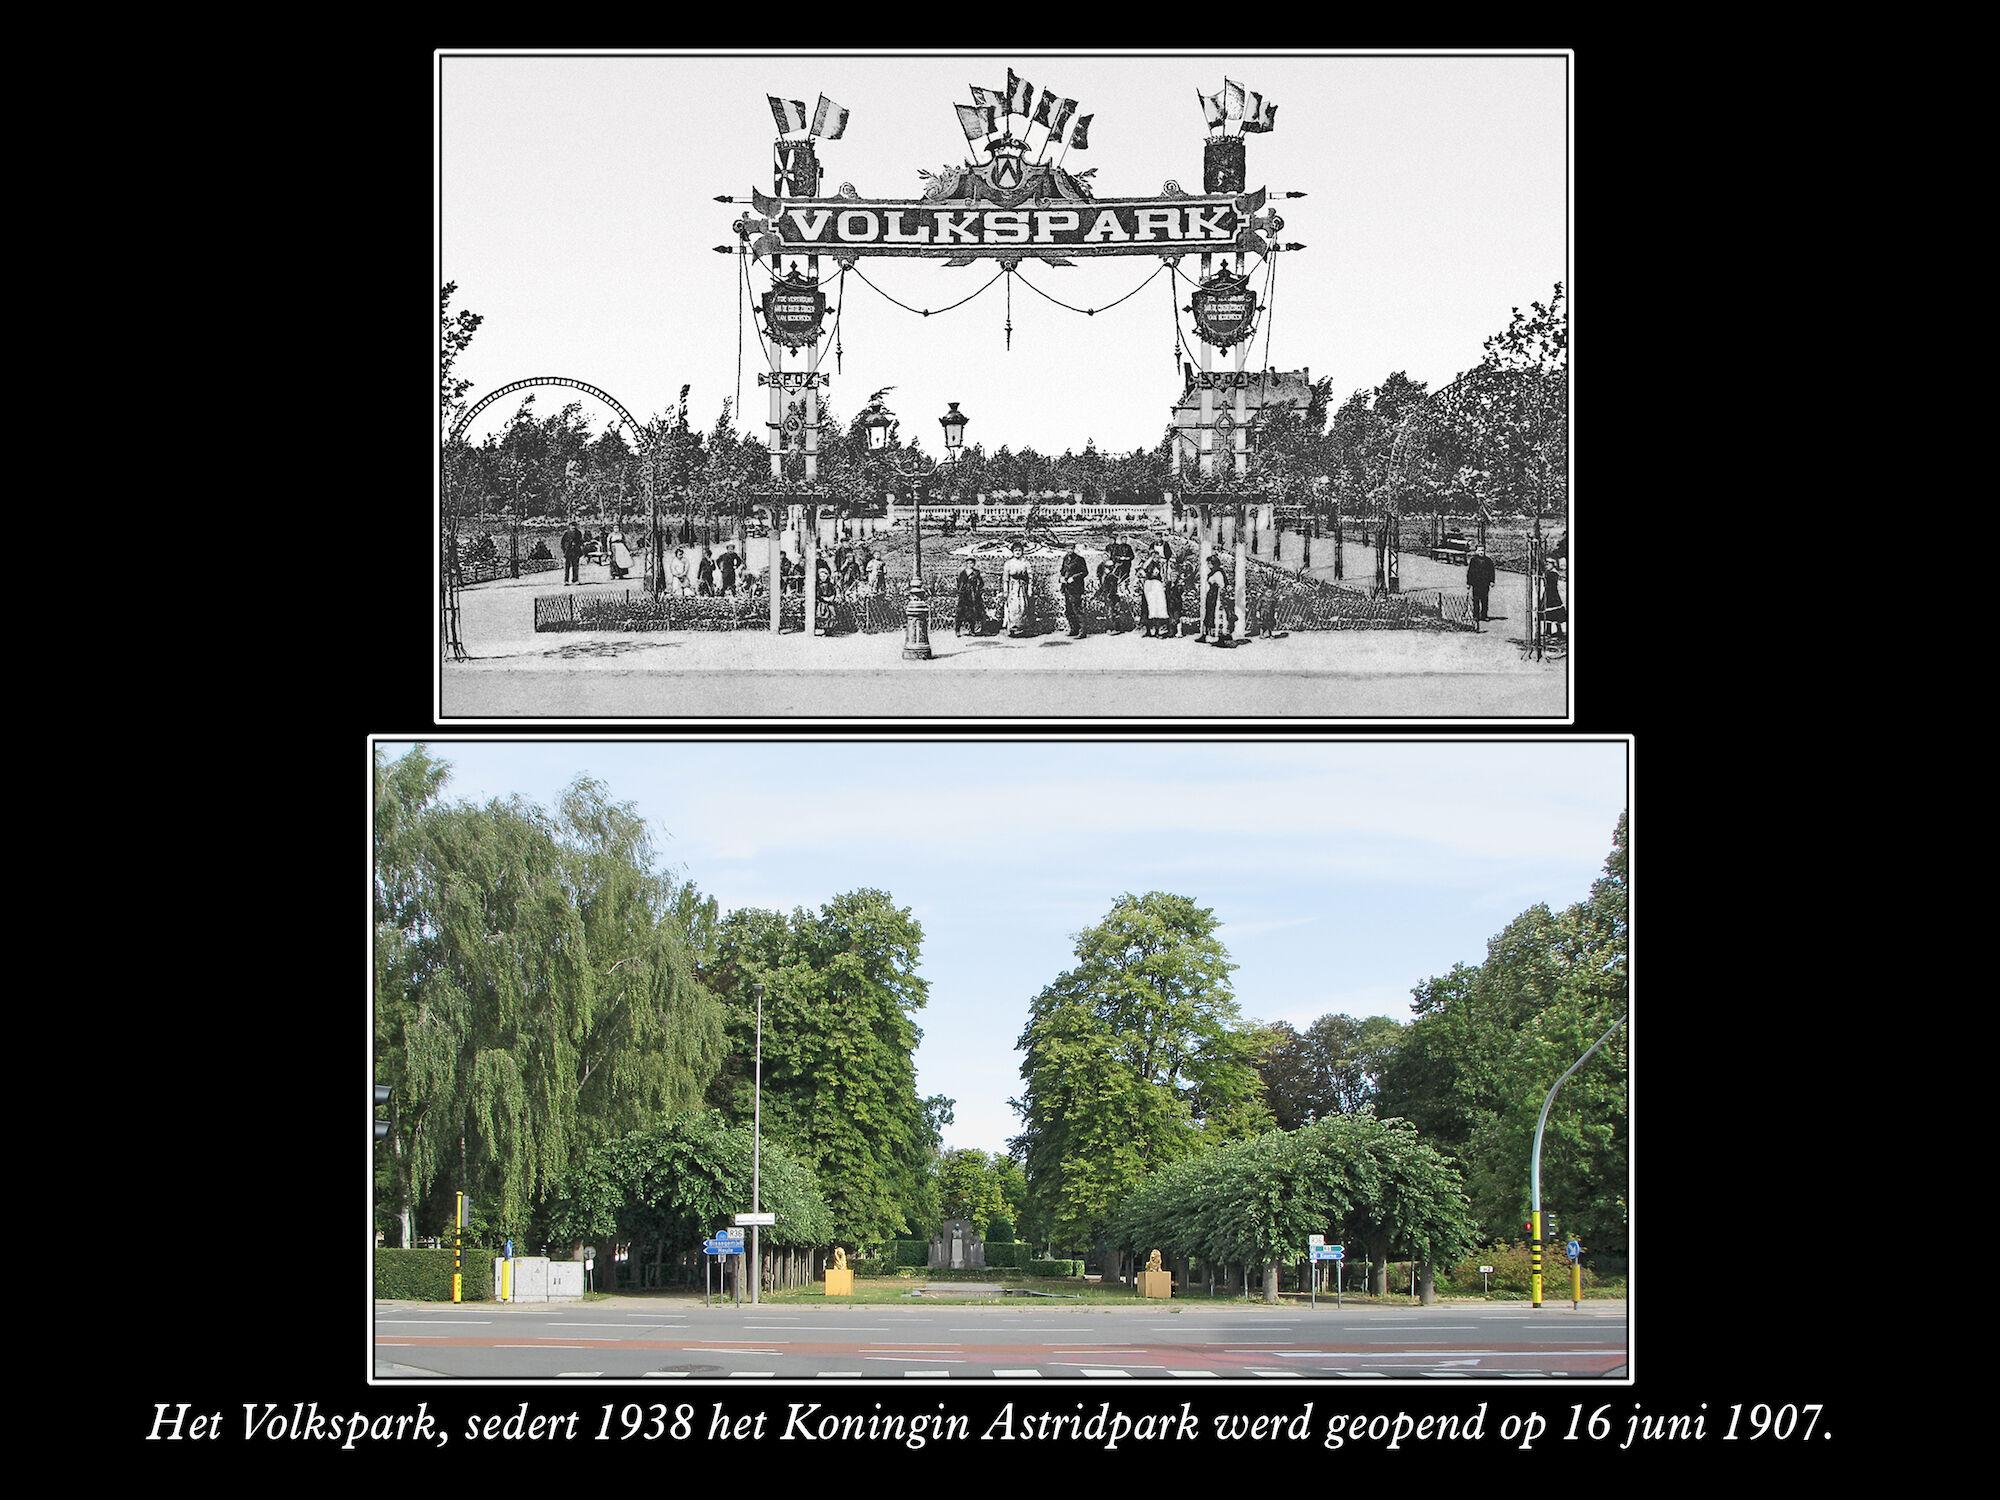 Volkspark